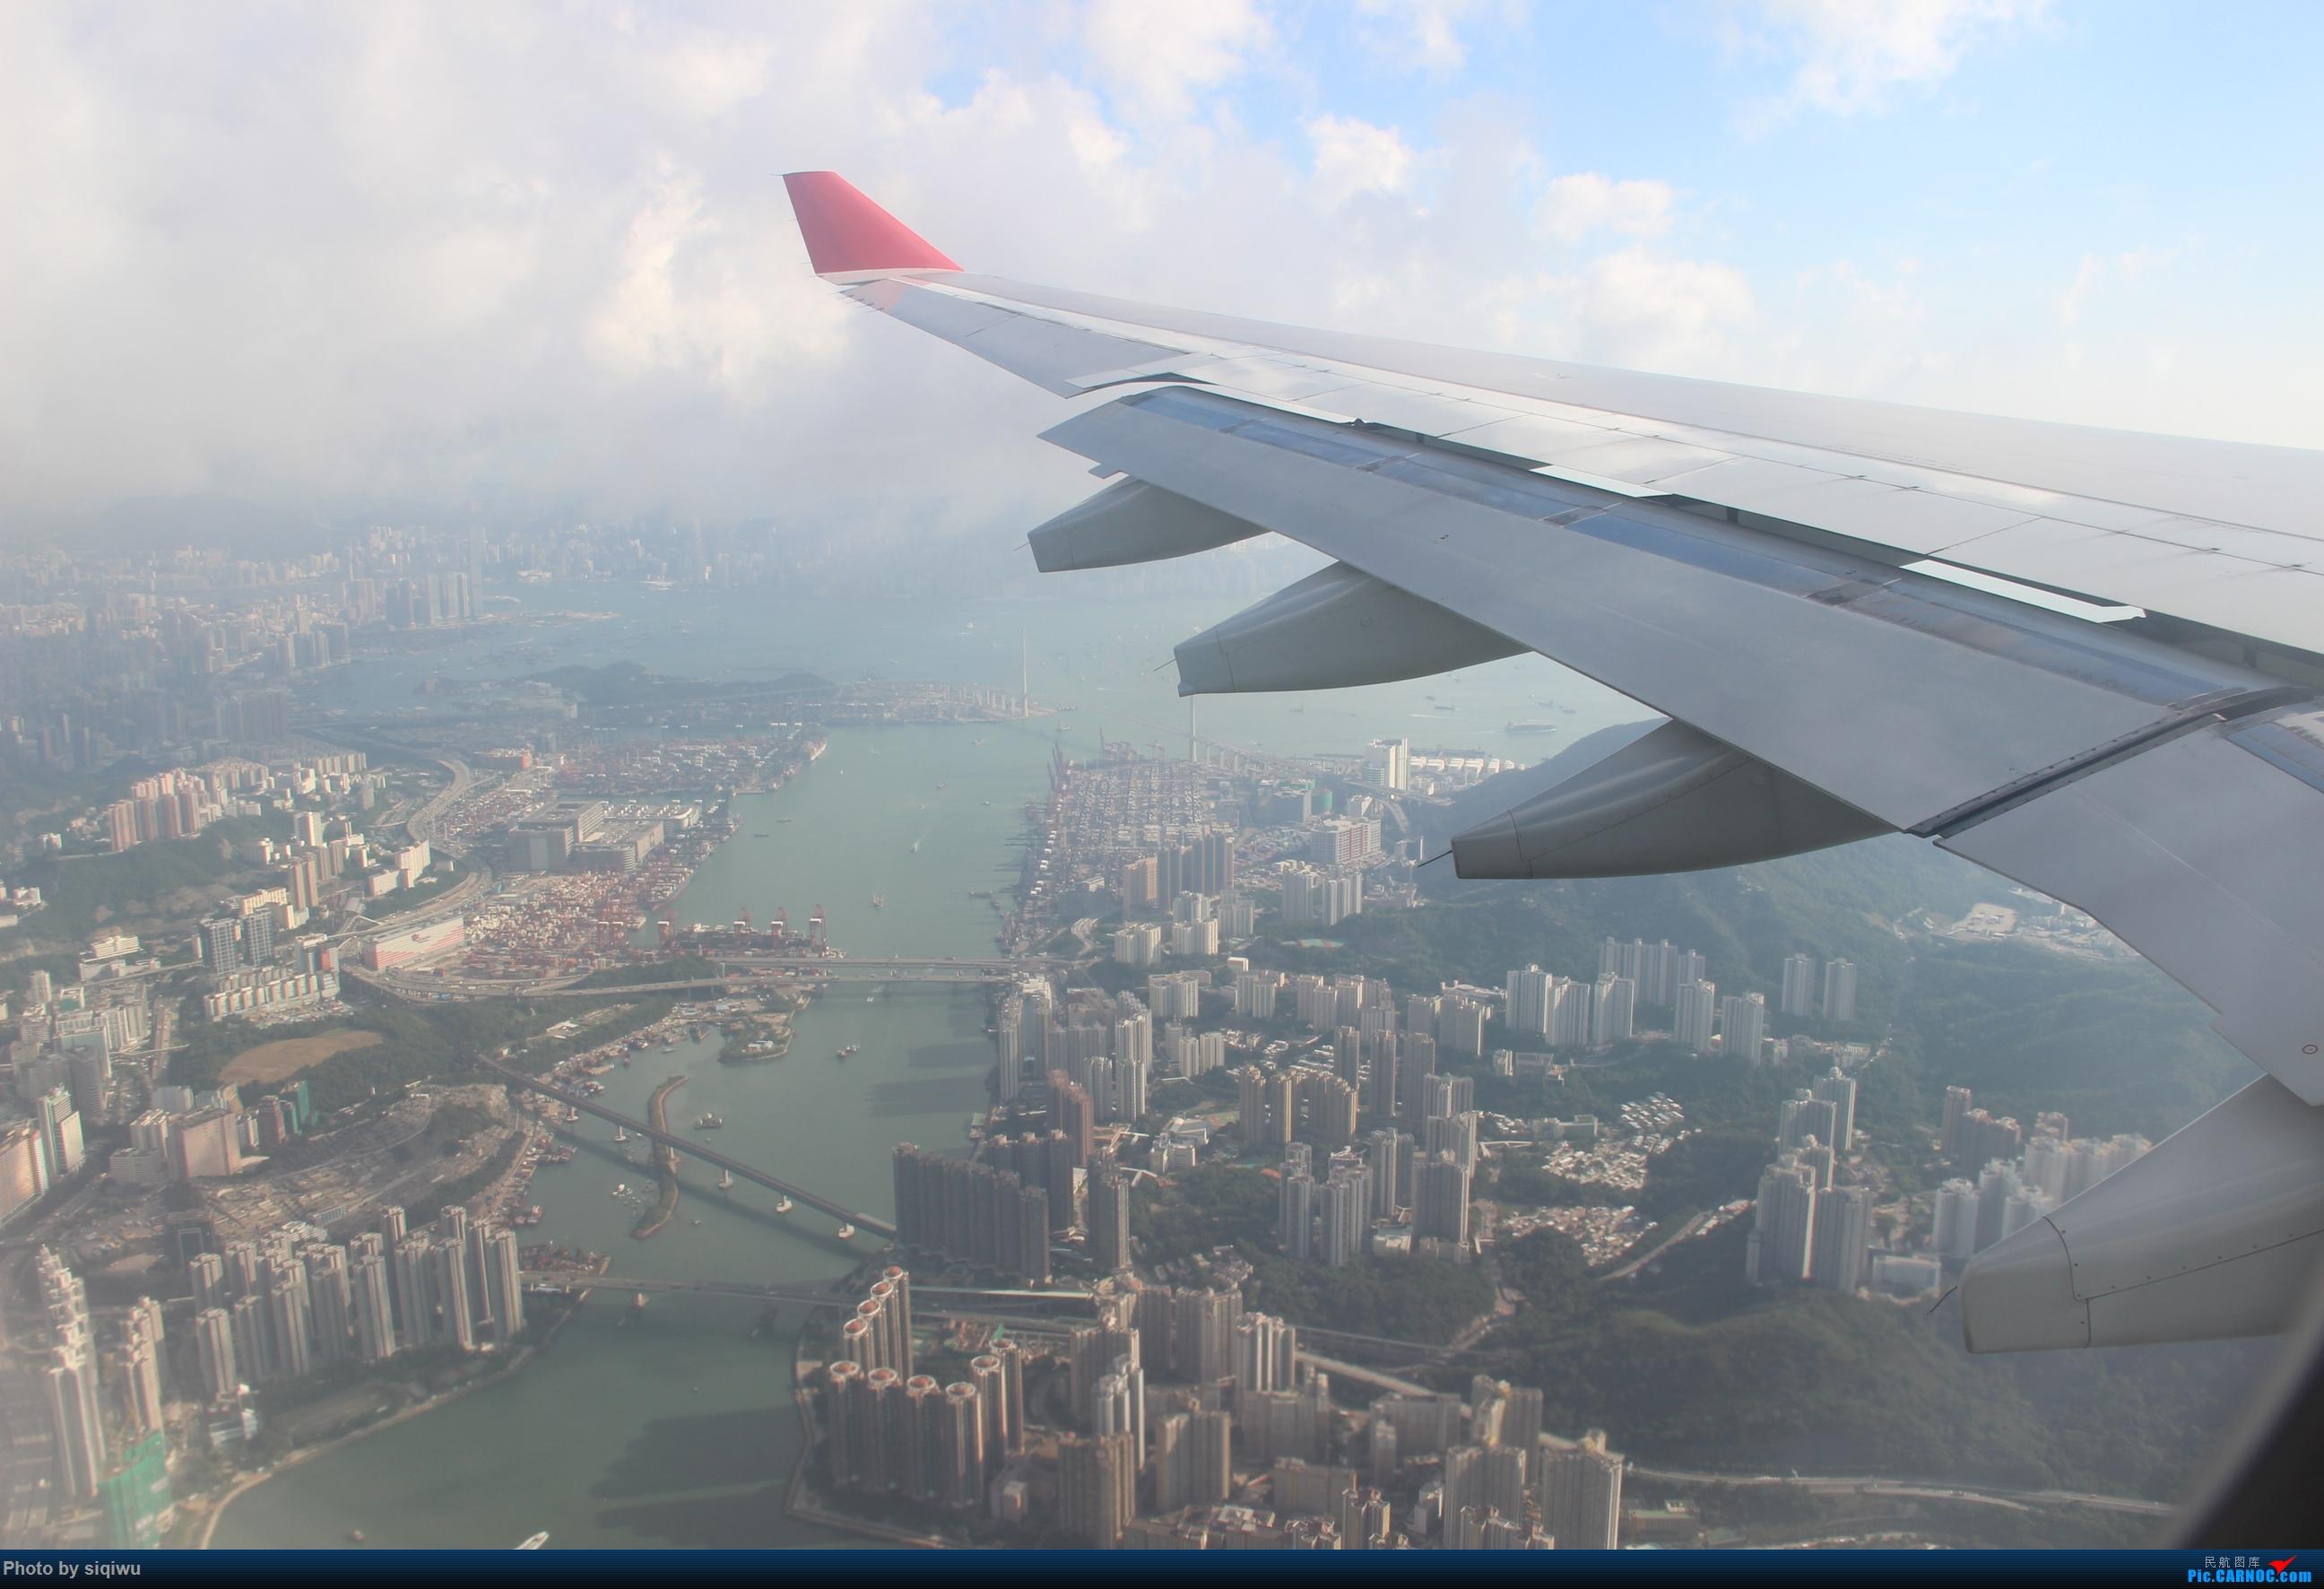 Re:[原创]PVG-HKG-KUL-HKG-PVG 四天往返,CX/KA AIRBUS A330-300